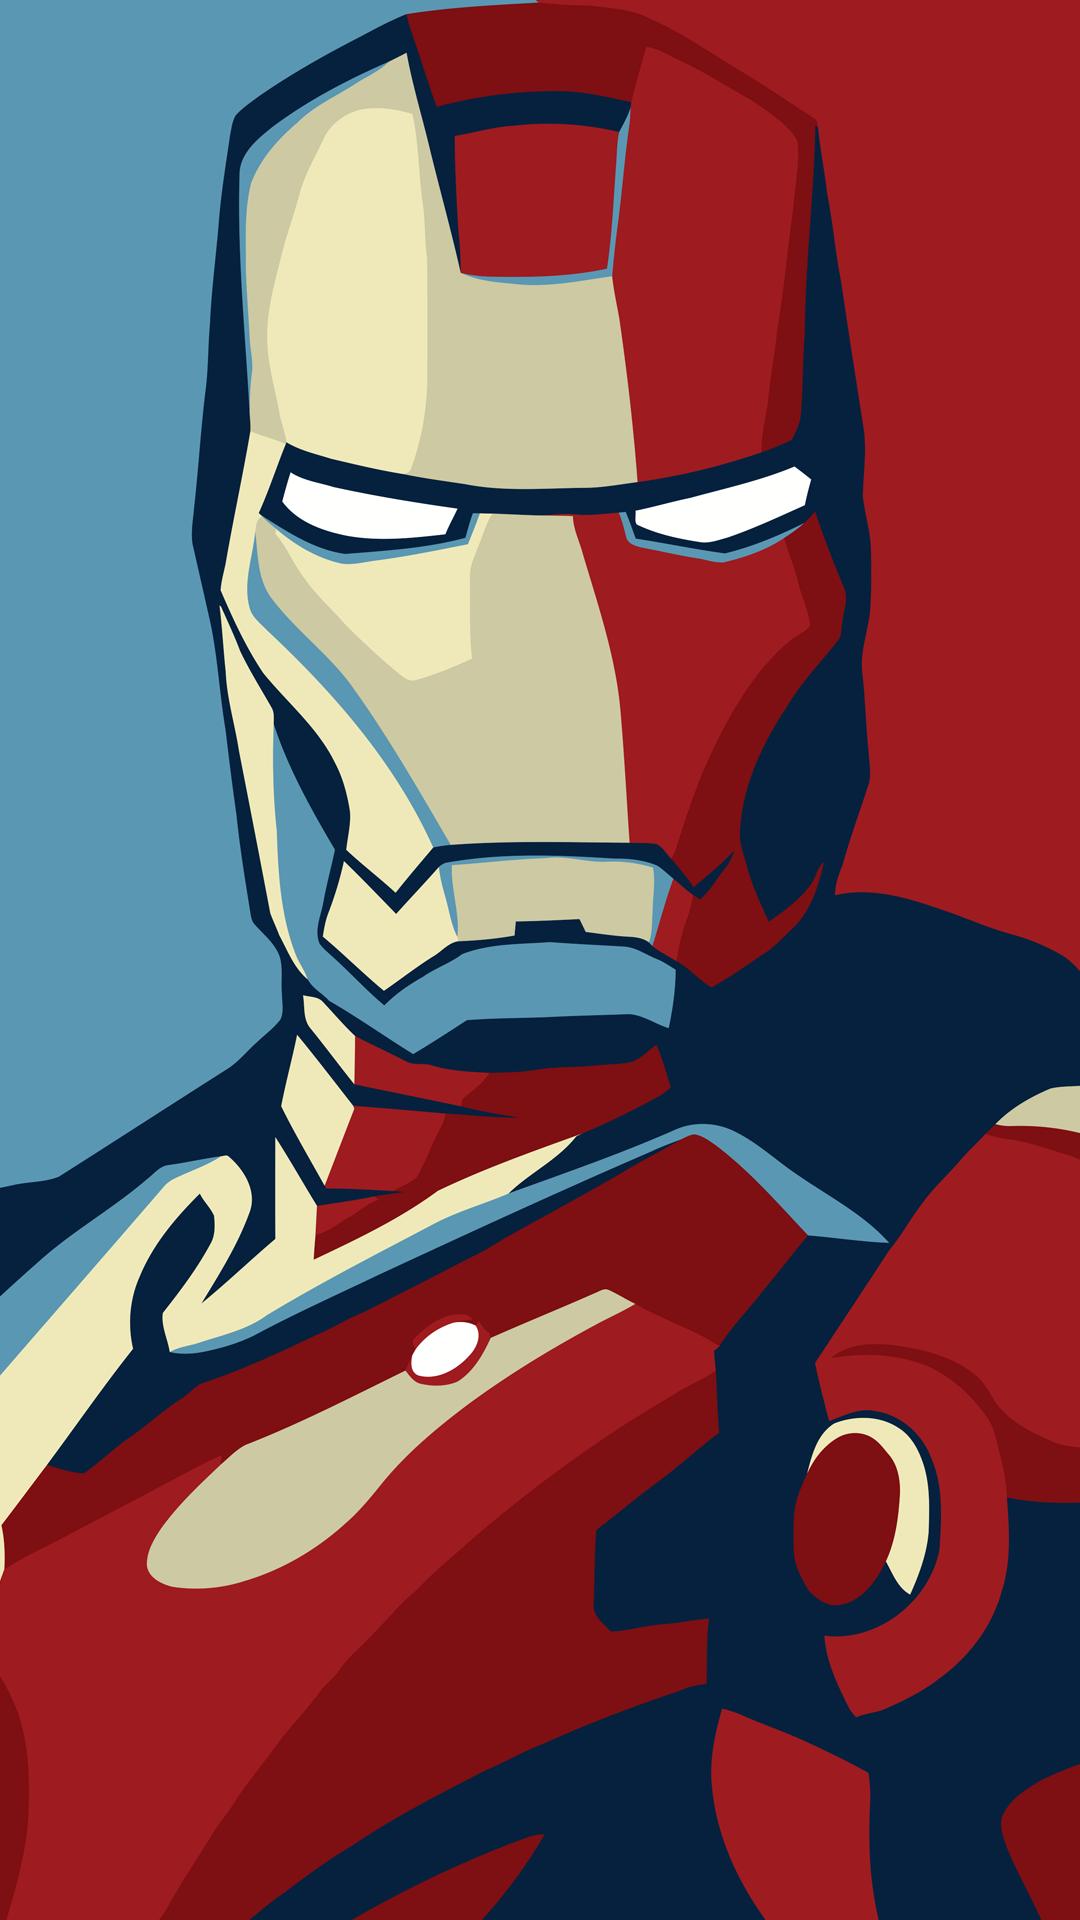 Pin By Stephanie Friderici On Iron Man Iron Man Wallpaper Iron